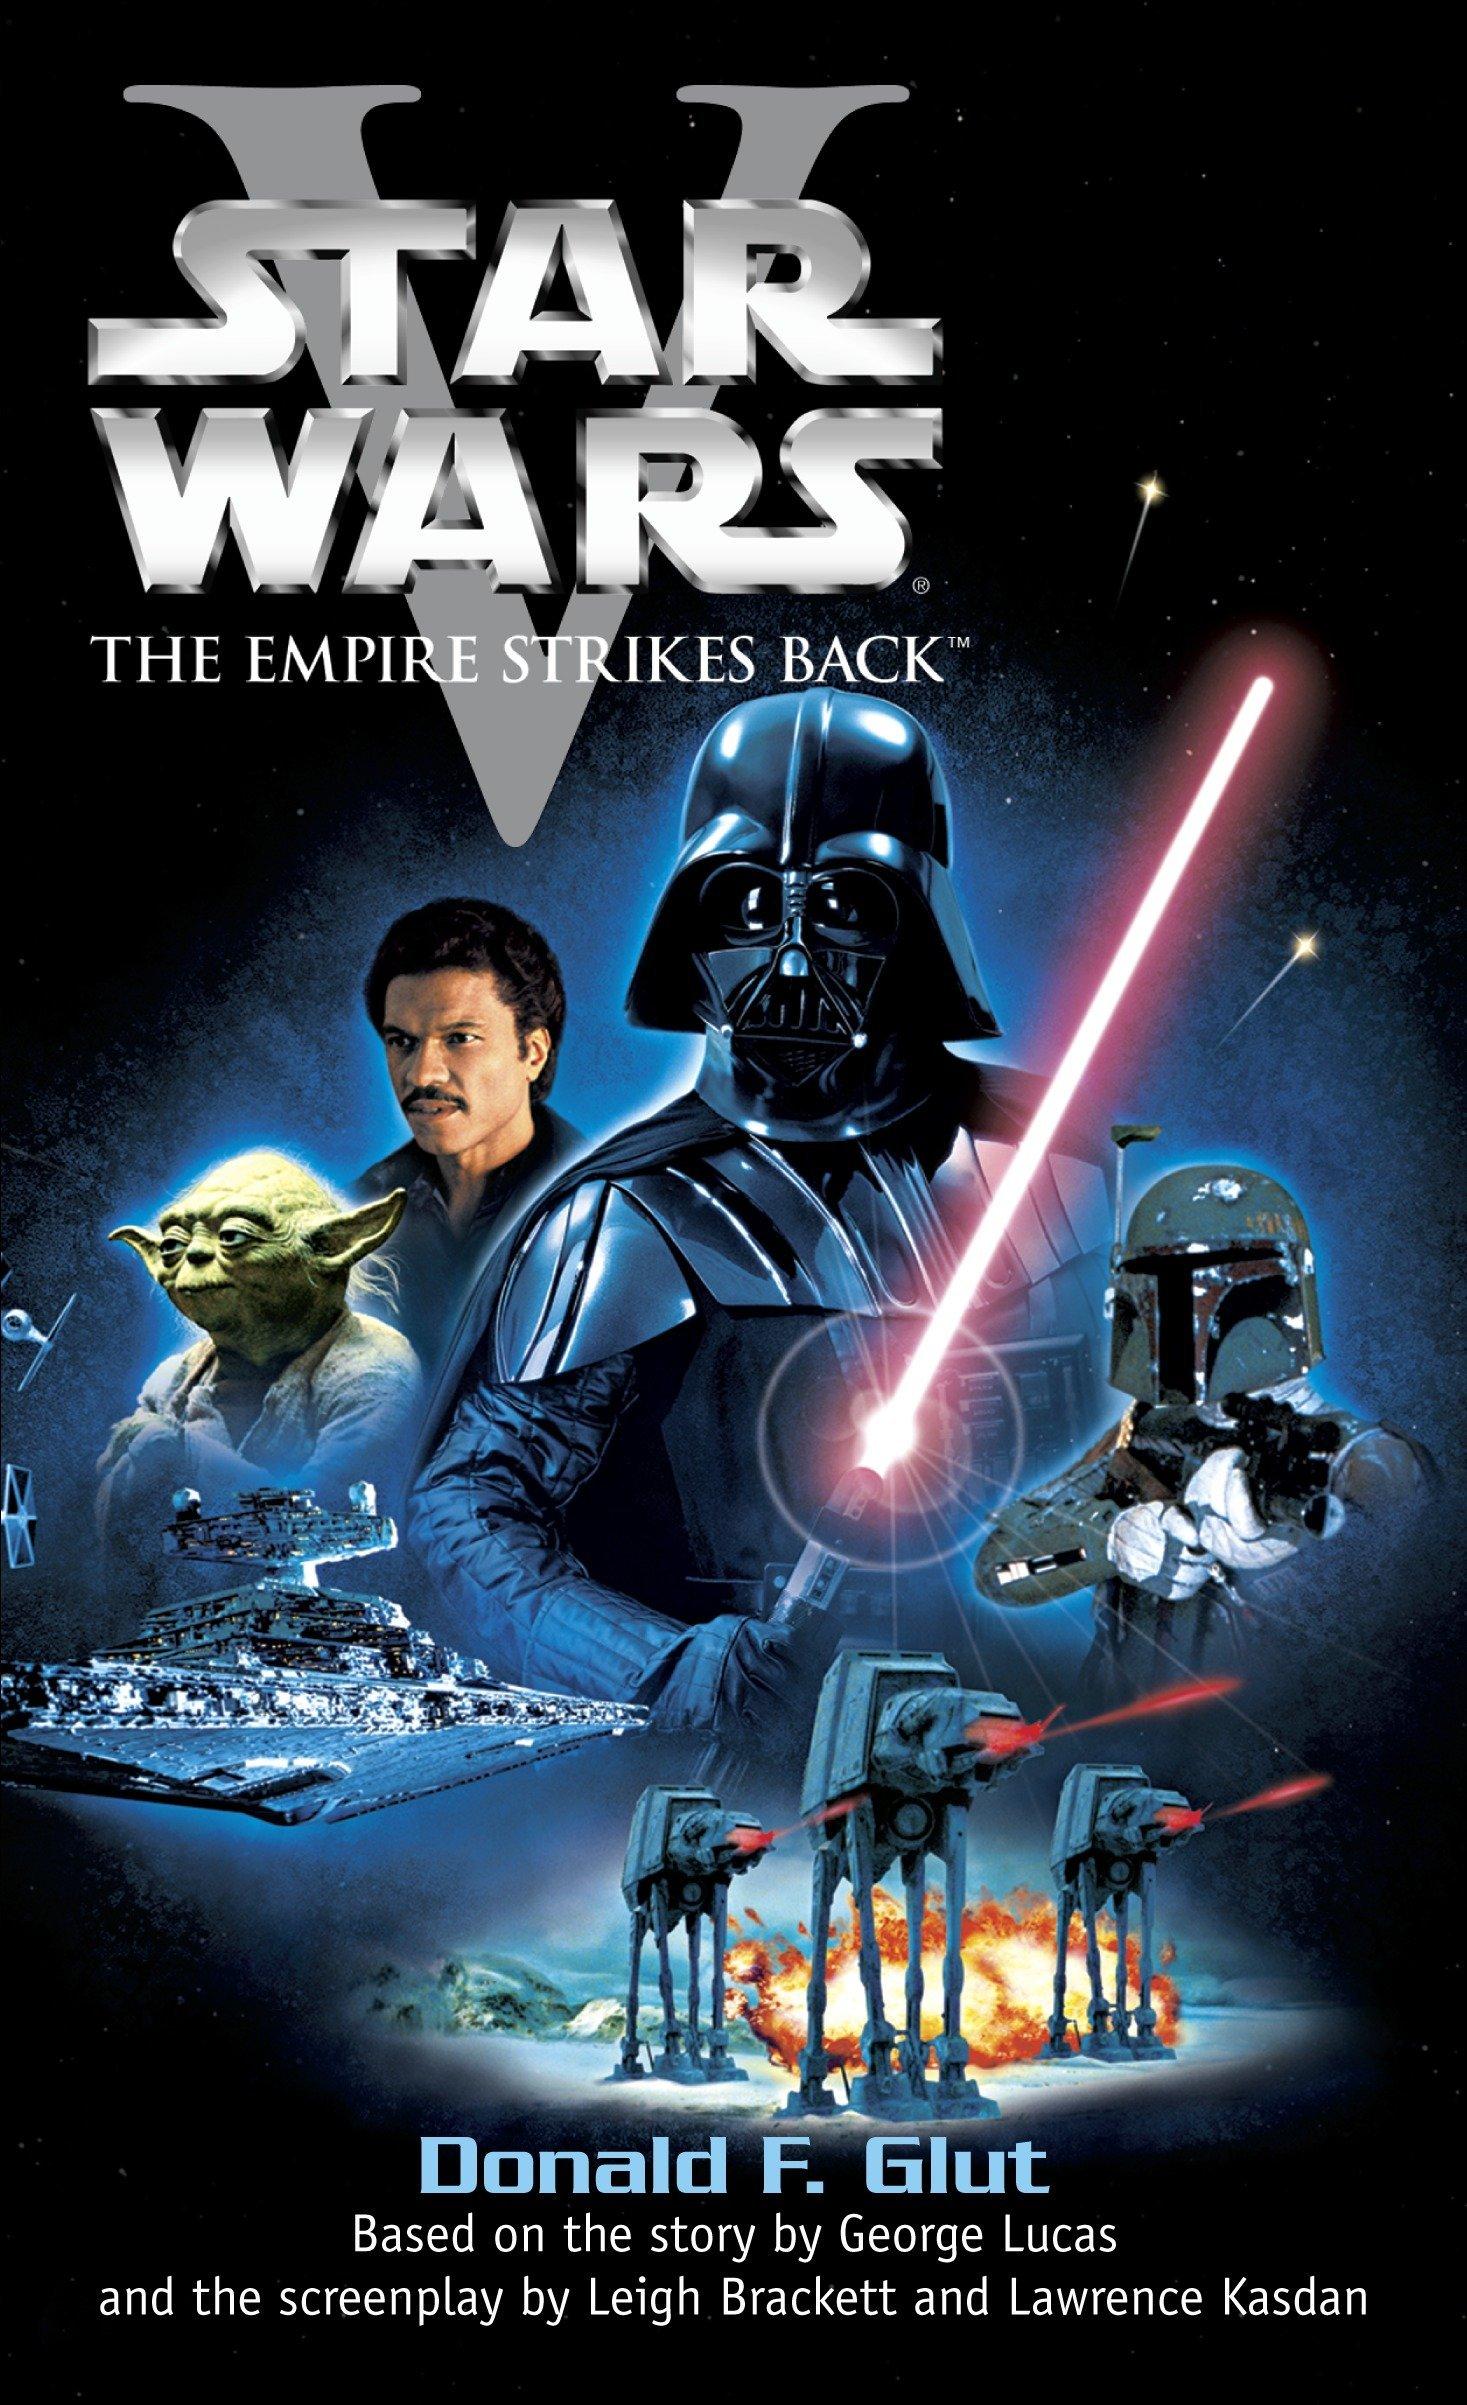 Amazon.com: Star Wars, Episode V: The Empire Strikes Back (9780345320223): Glut, Donald F.: Books